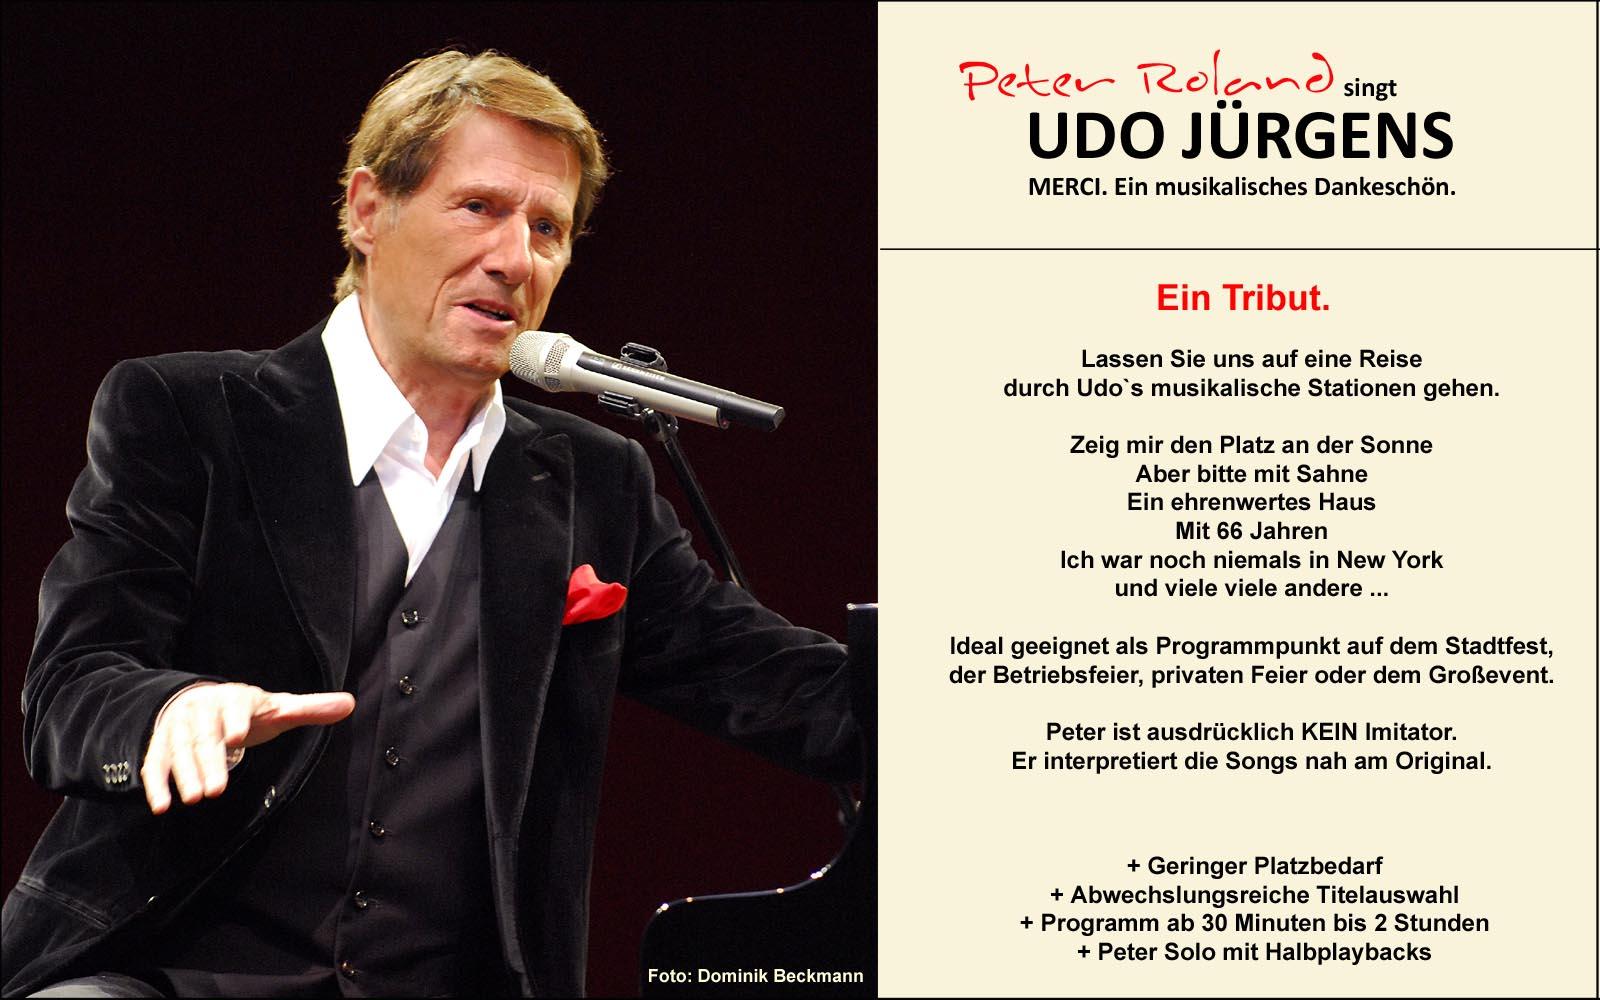 Udo Jürgens 1600 1000